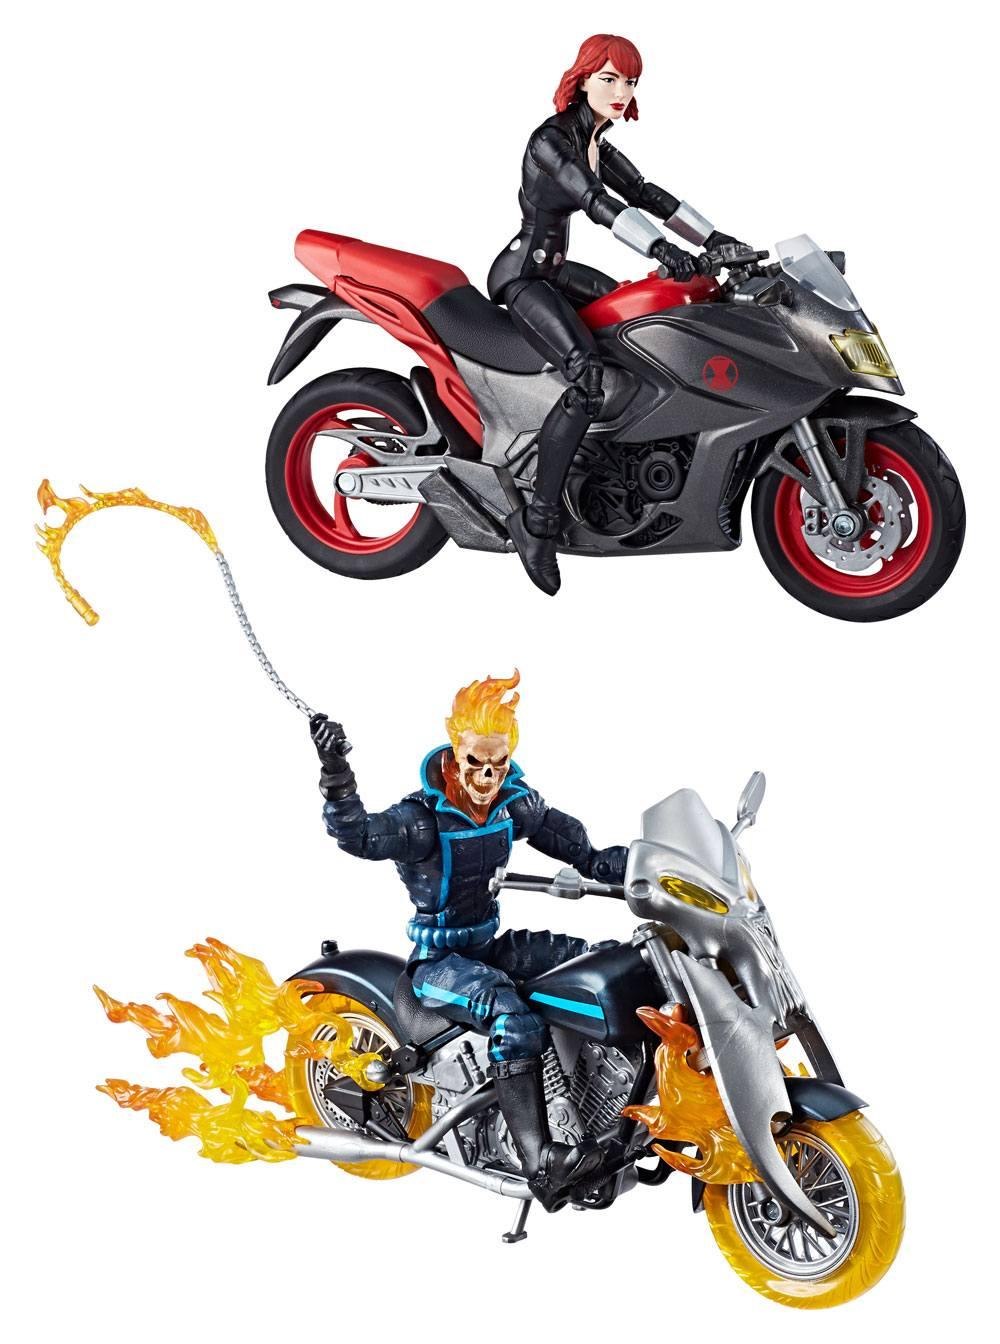 Marvel Legends Series Ultimate Action Figures 15 cm 2018 Wave 1 Assortment (3)